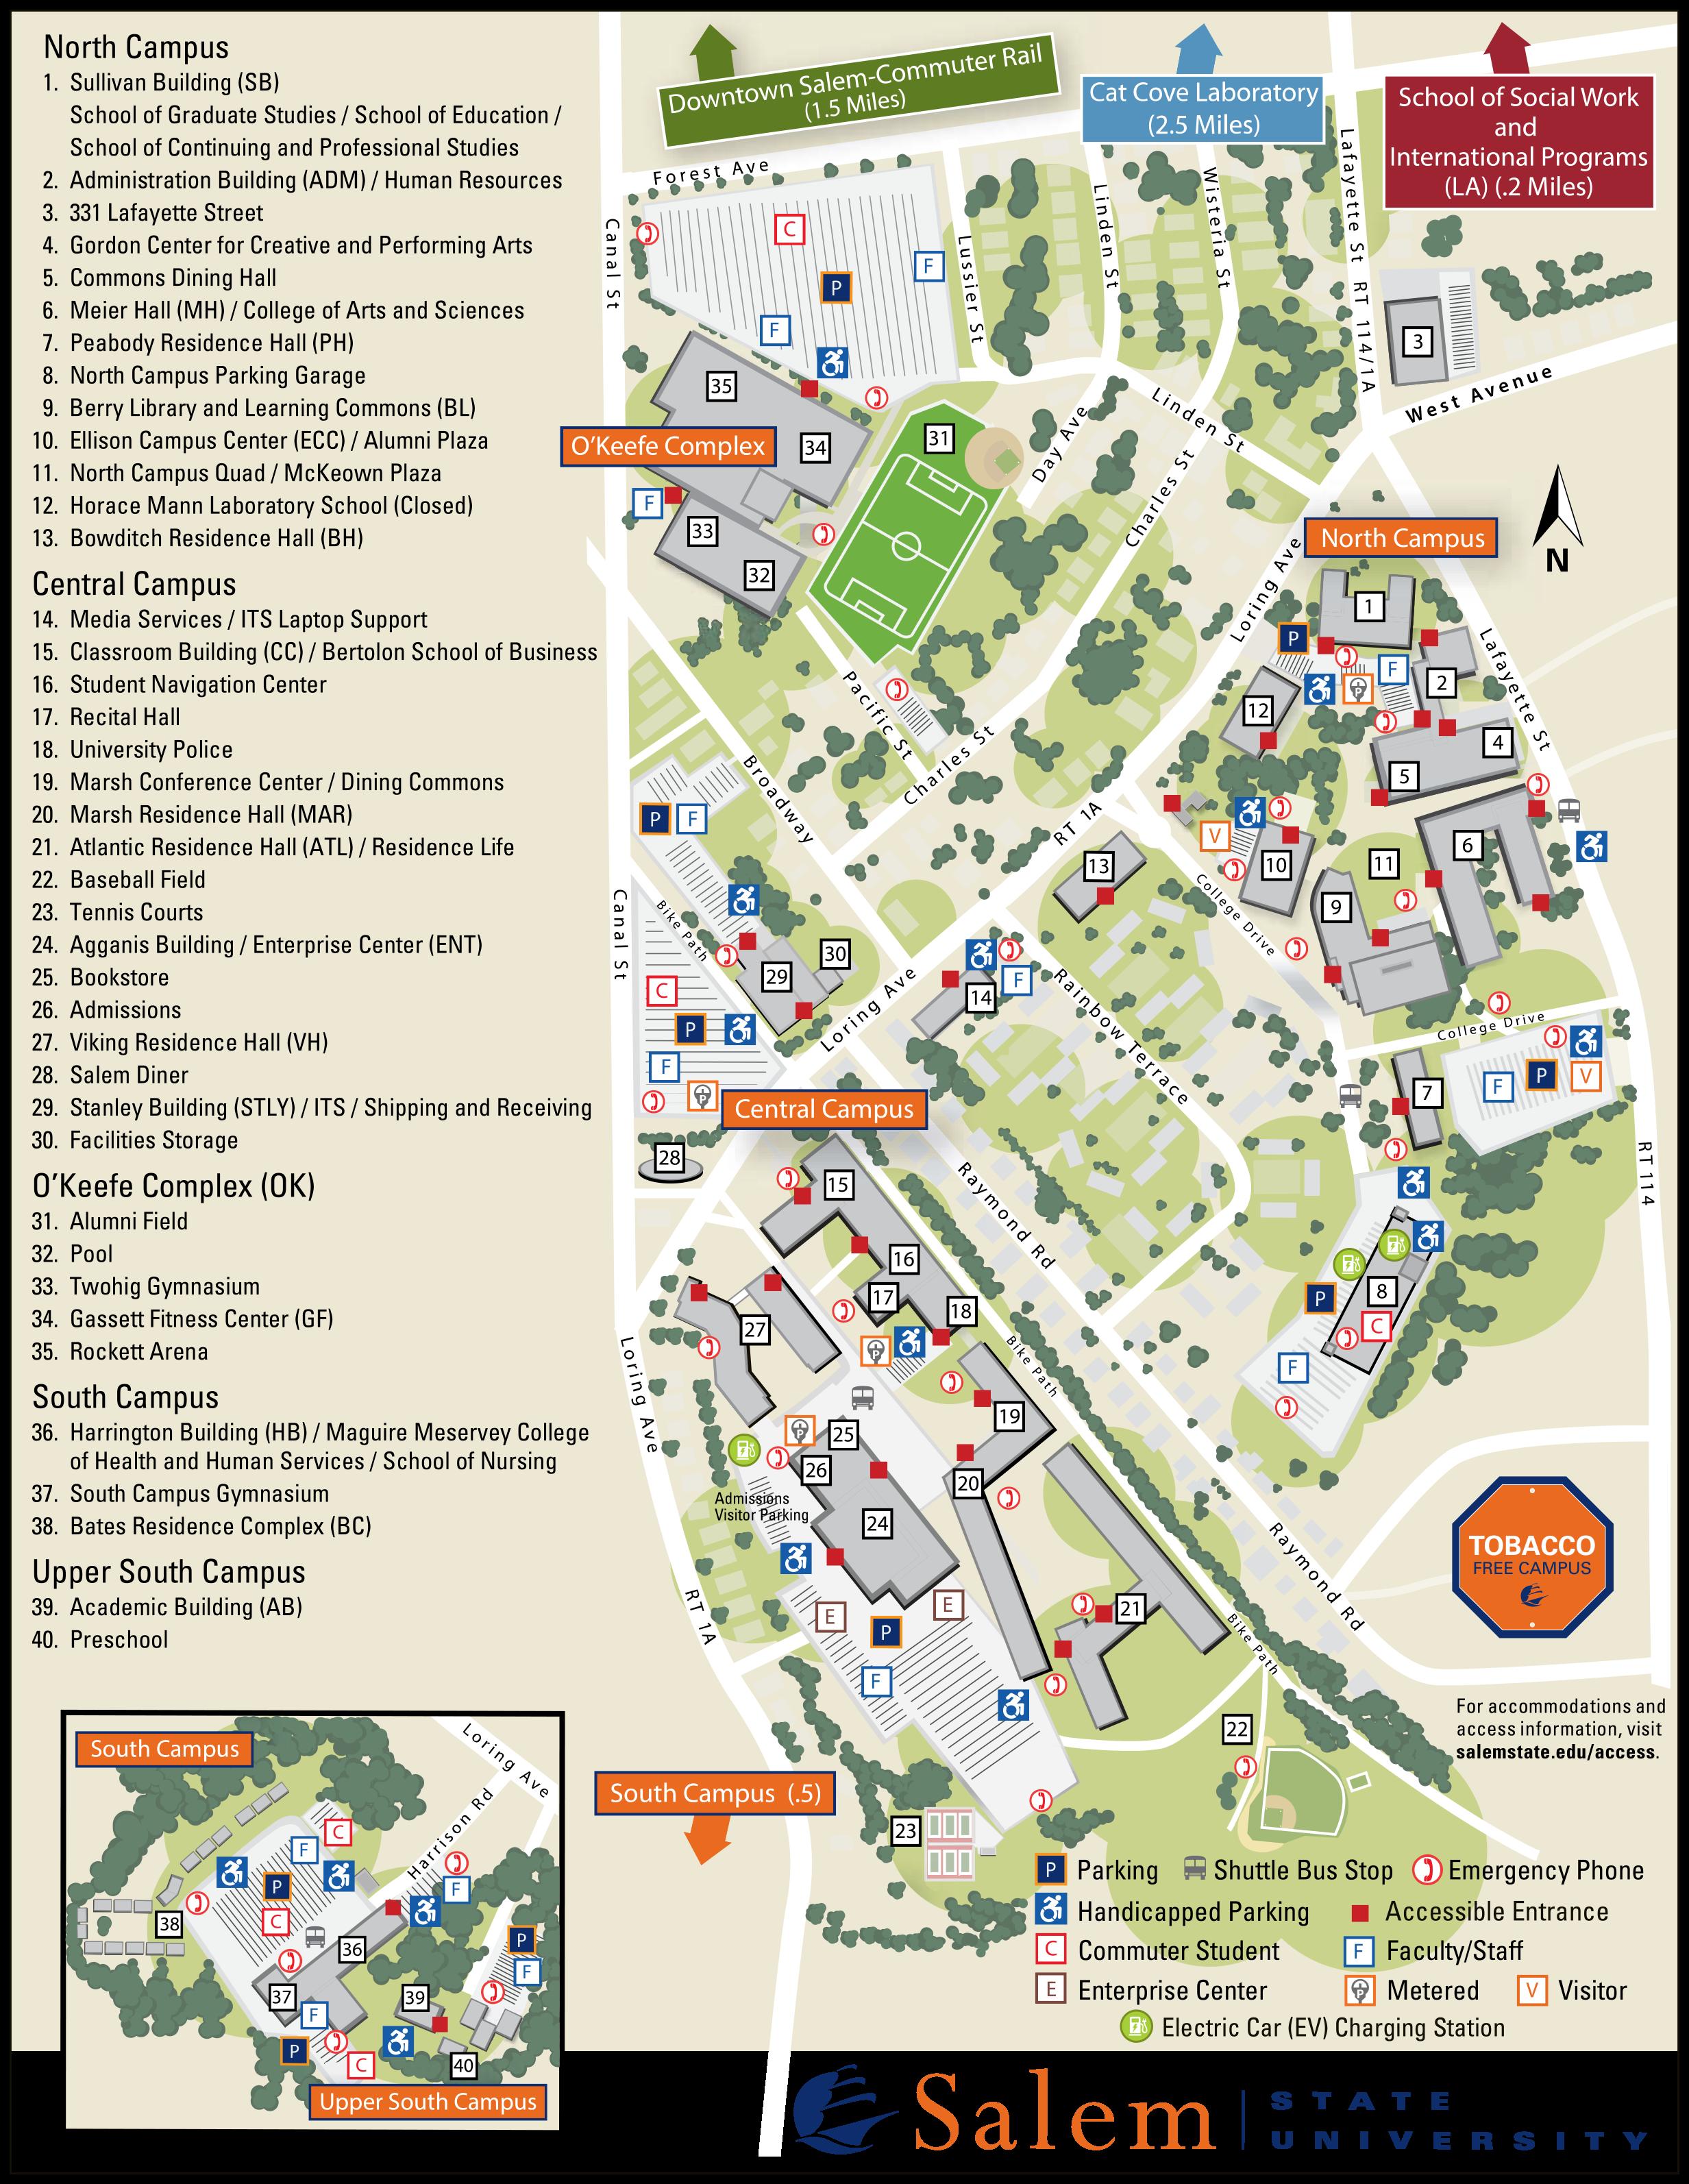 ssu campus map 2021